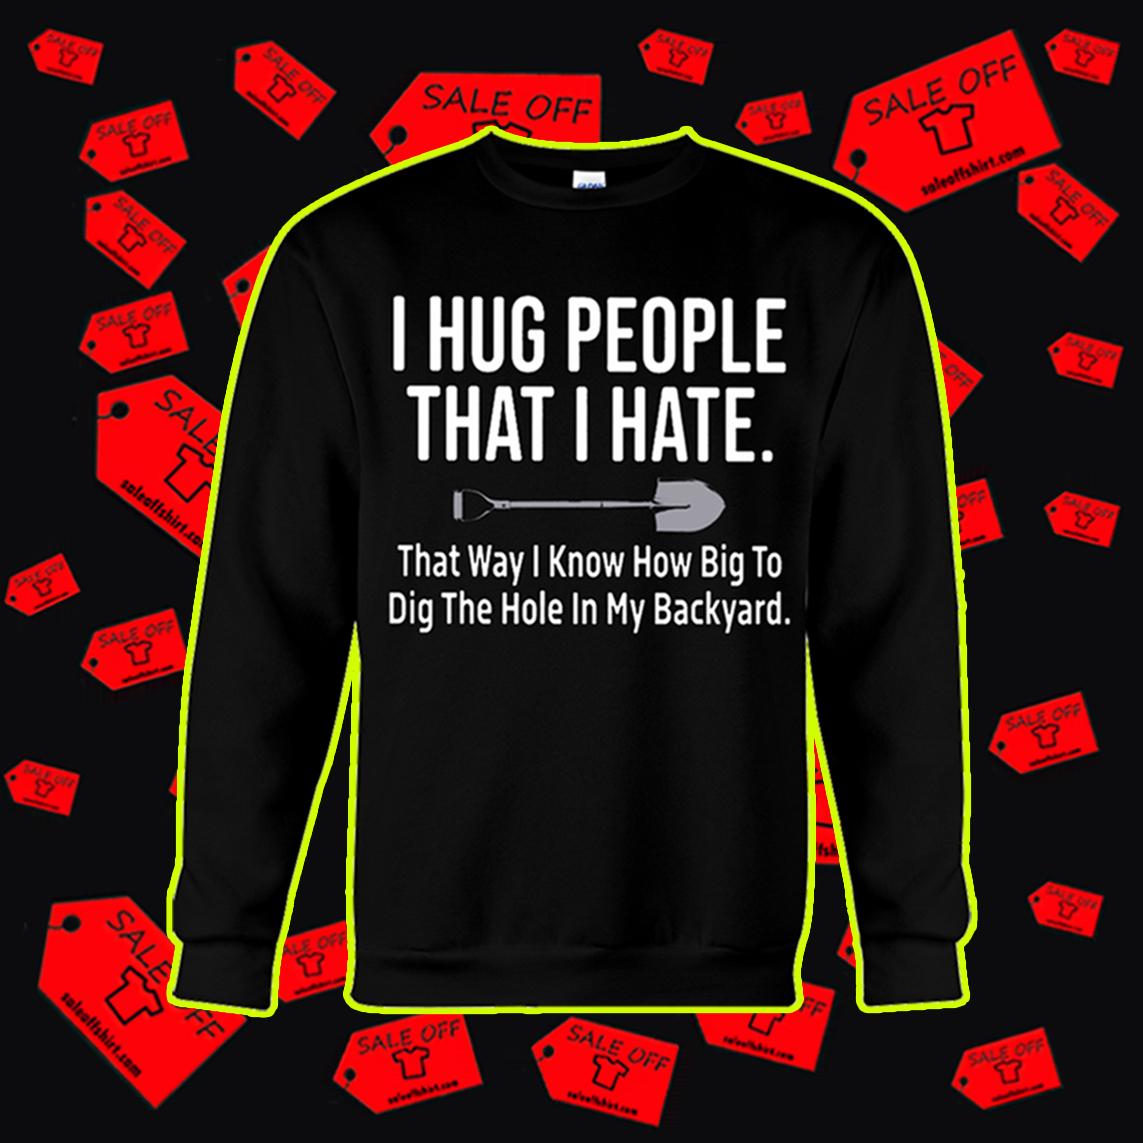 I hug people that I hate that way I know how big to dig the hole in my backyard sweatshirt